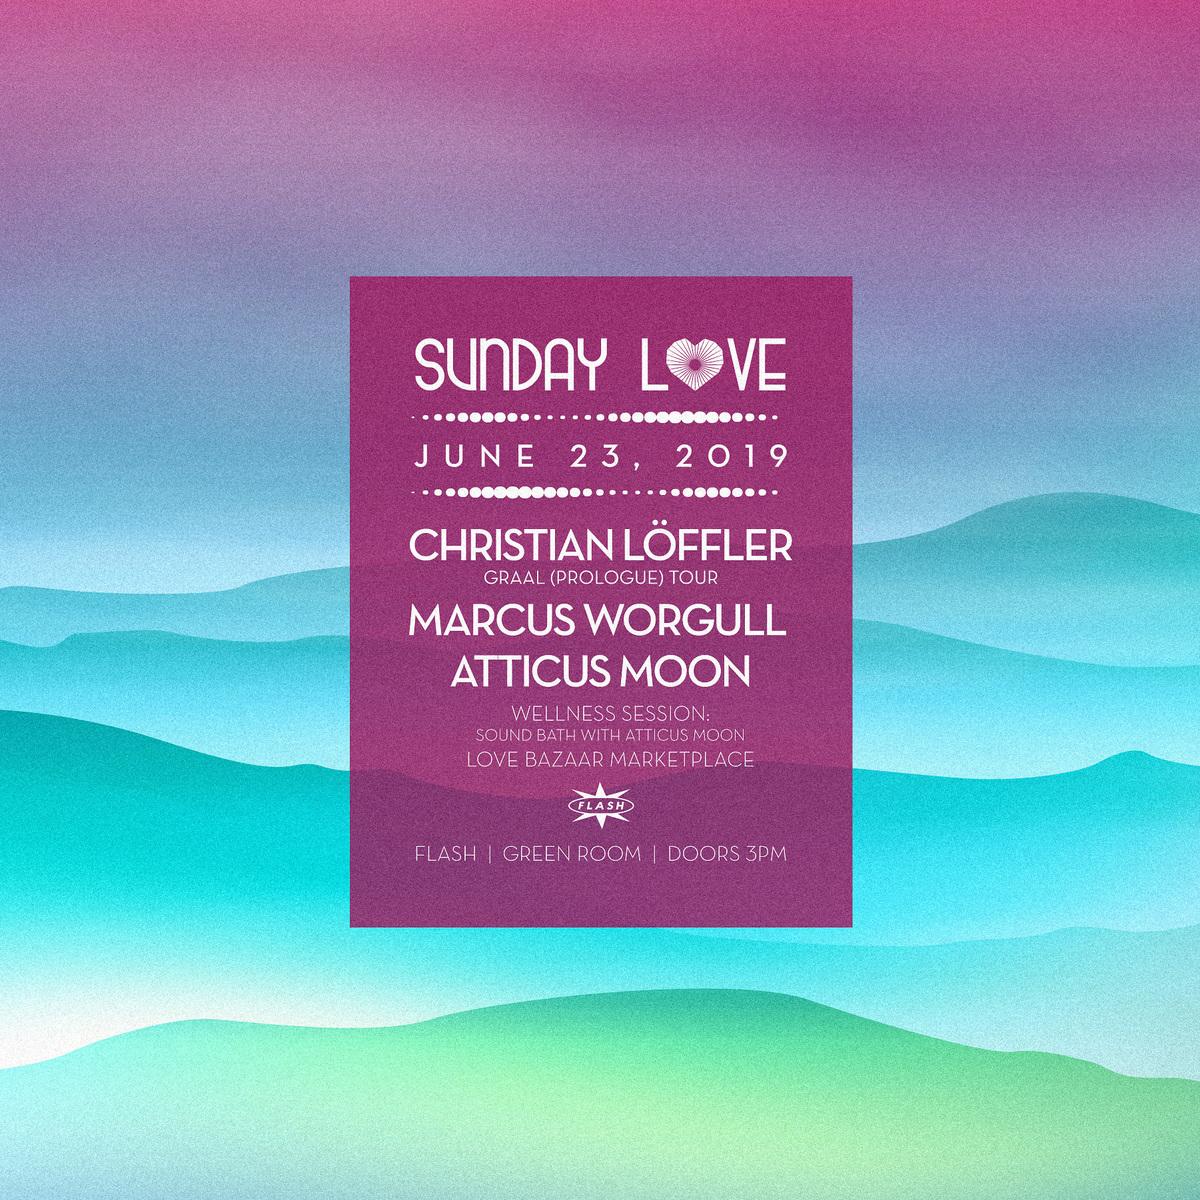 Sunday Love: Christian Löffler - Marcus Worgull - Atticus Moon event thumbnail